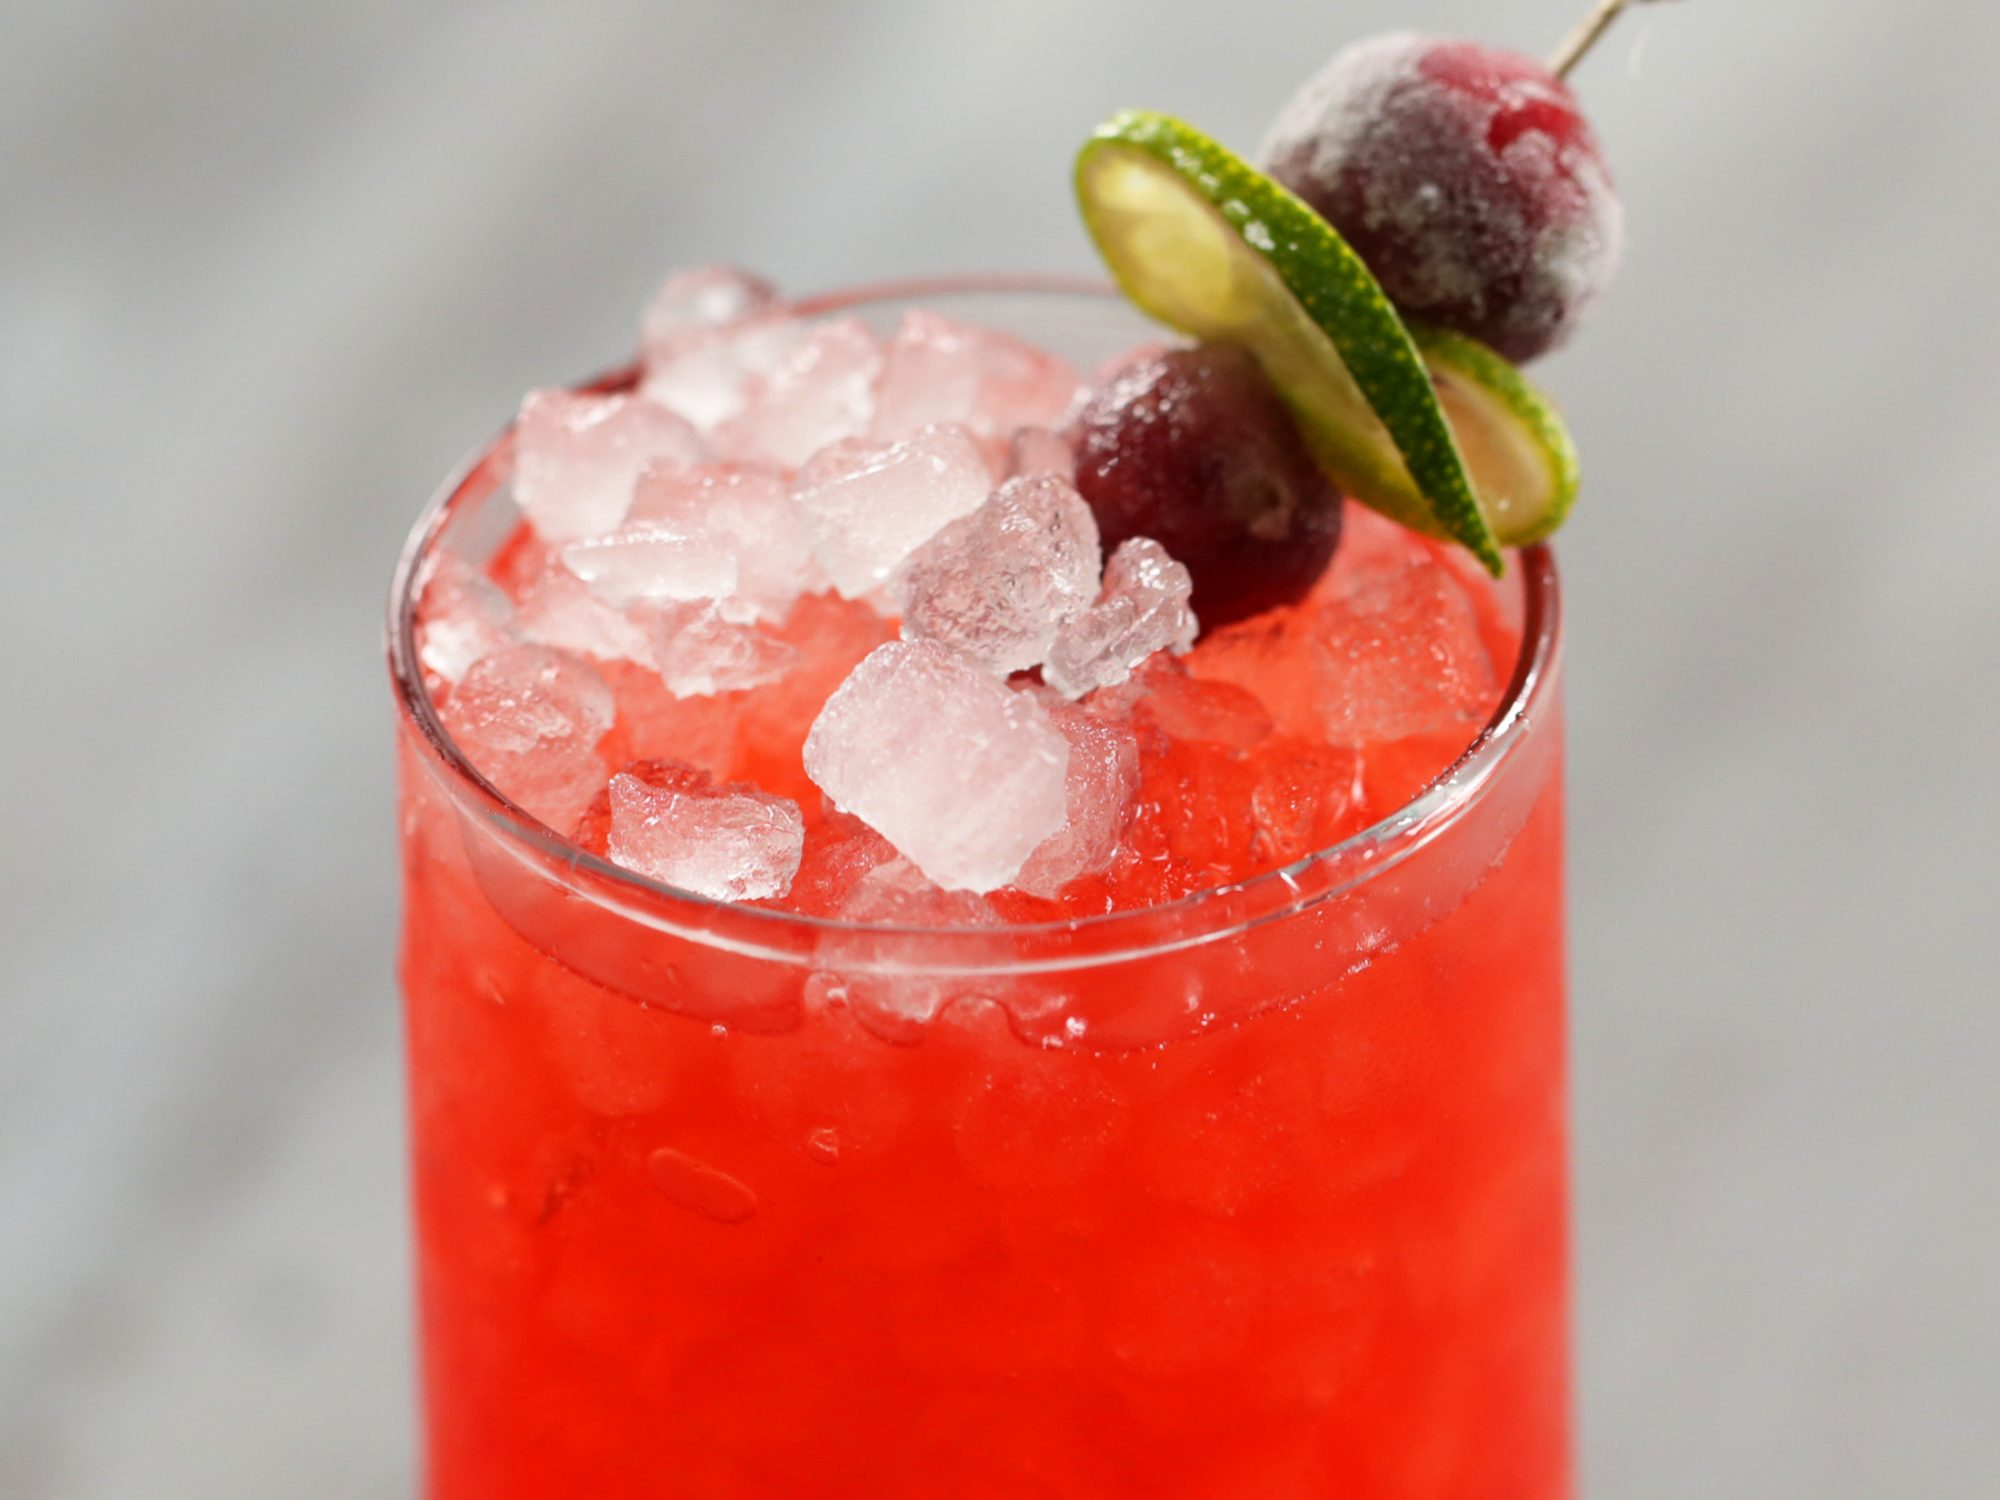 Cranberry-Limeade Spritzer image